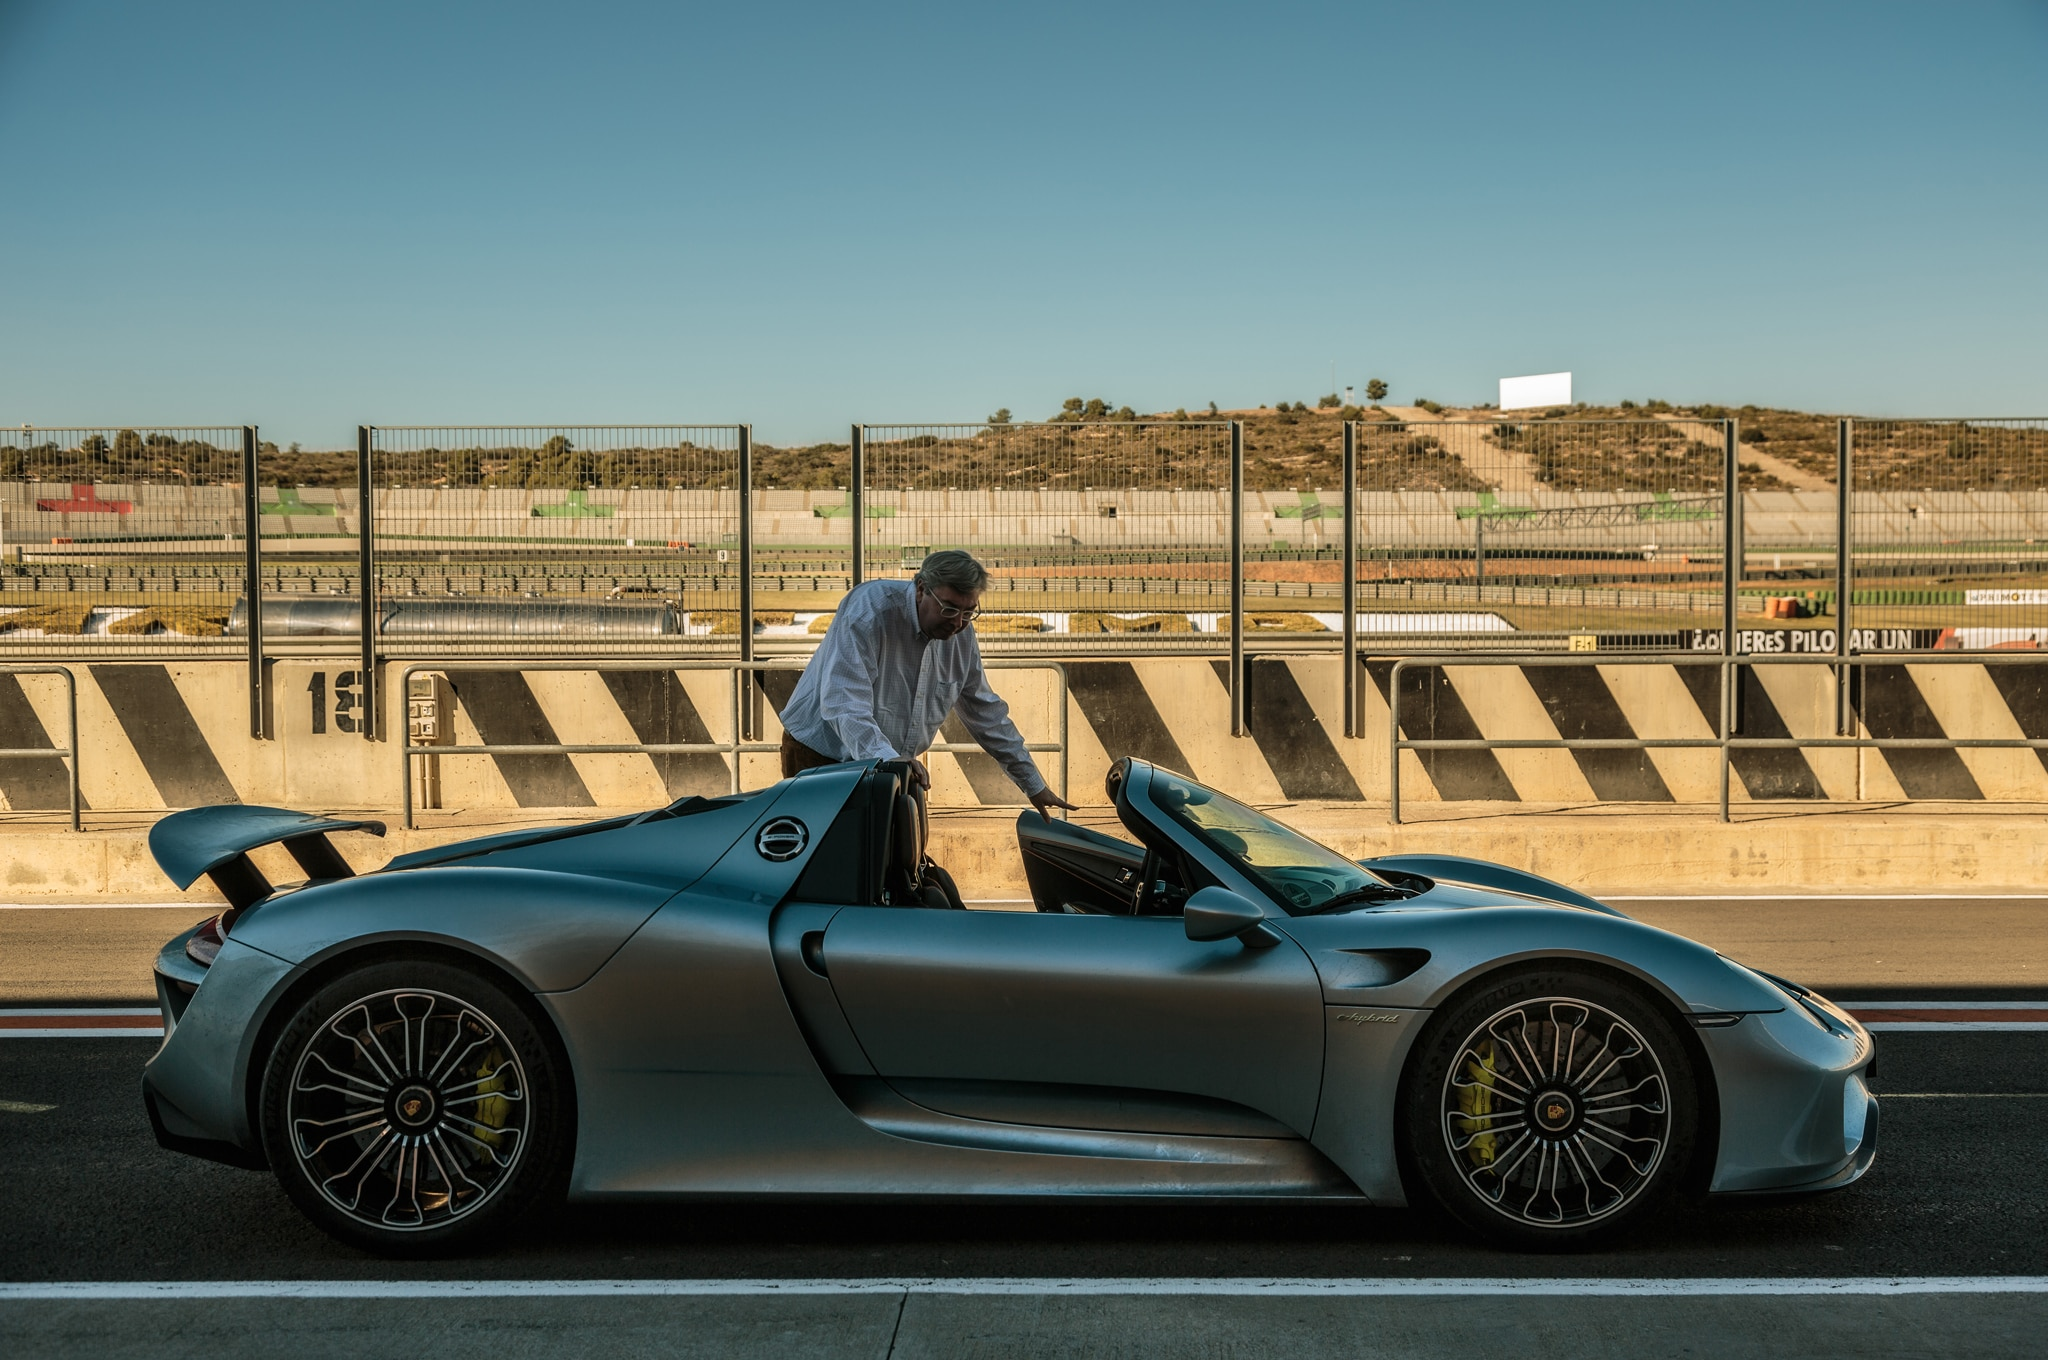 2014-Porsche-918-Spyder-in-Germany-side-profile Gorgeous Porsche 918 Spyder High-performance Concept Cars Trend